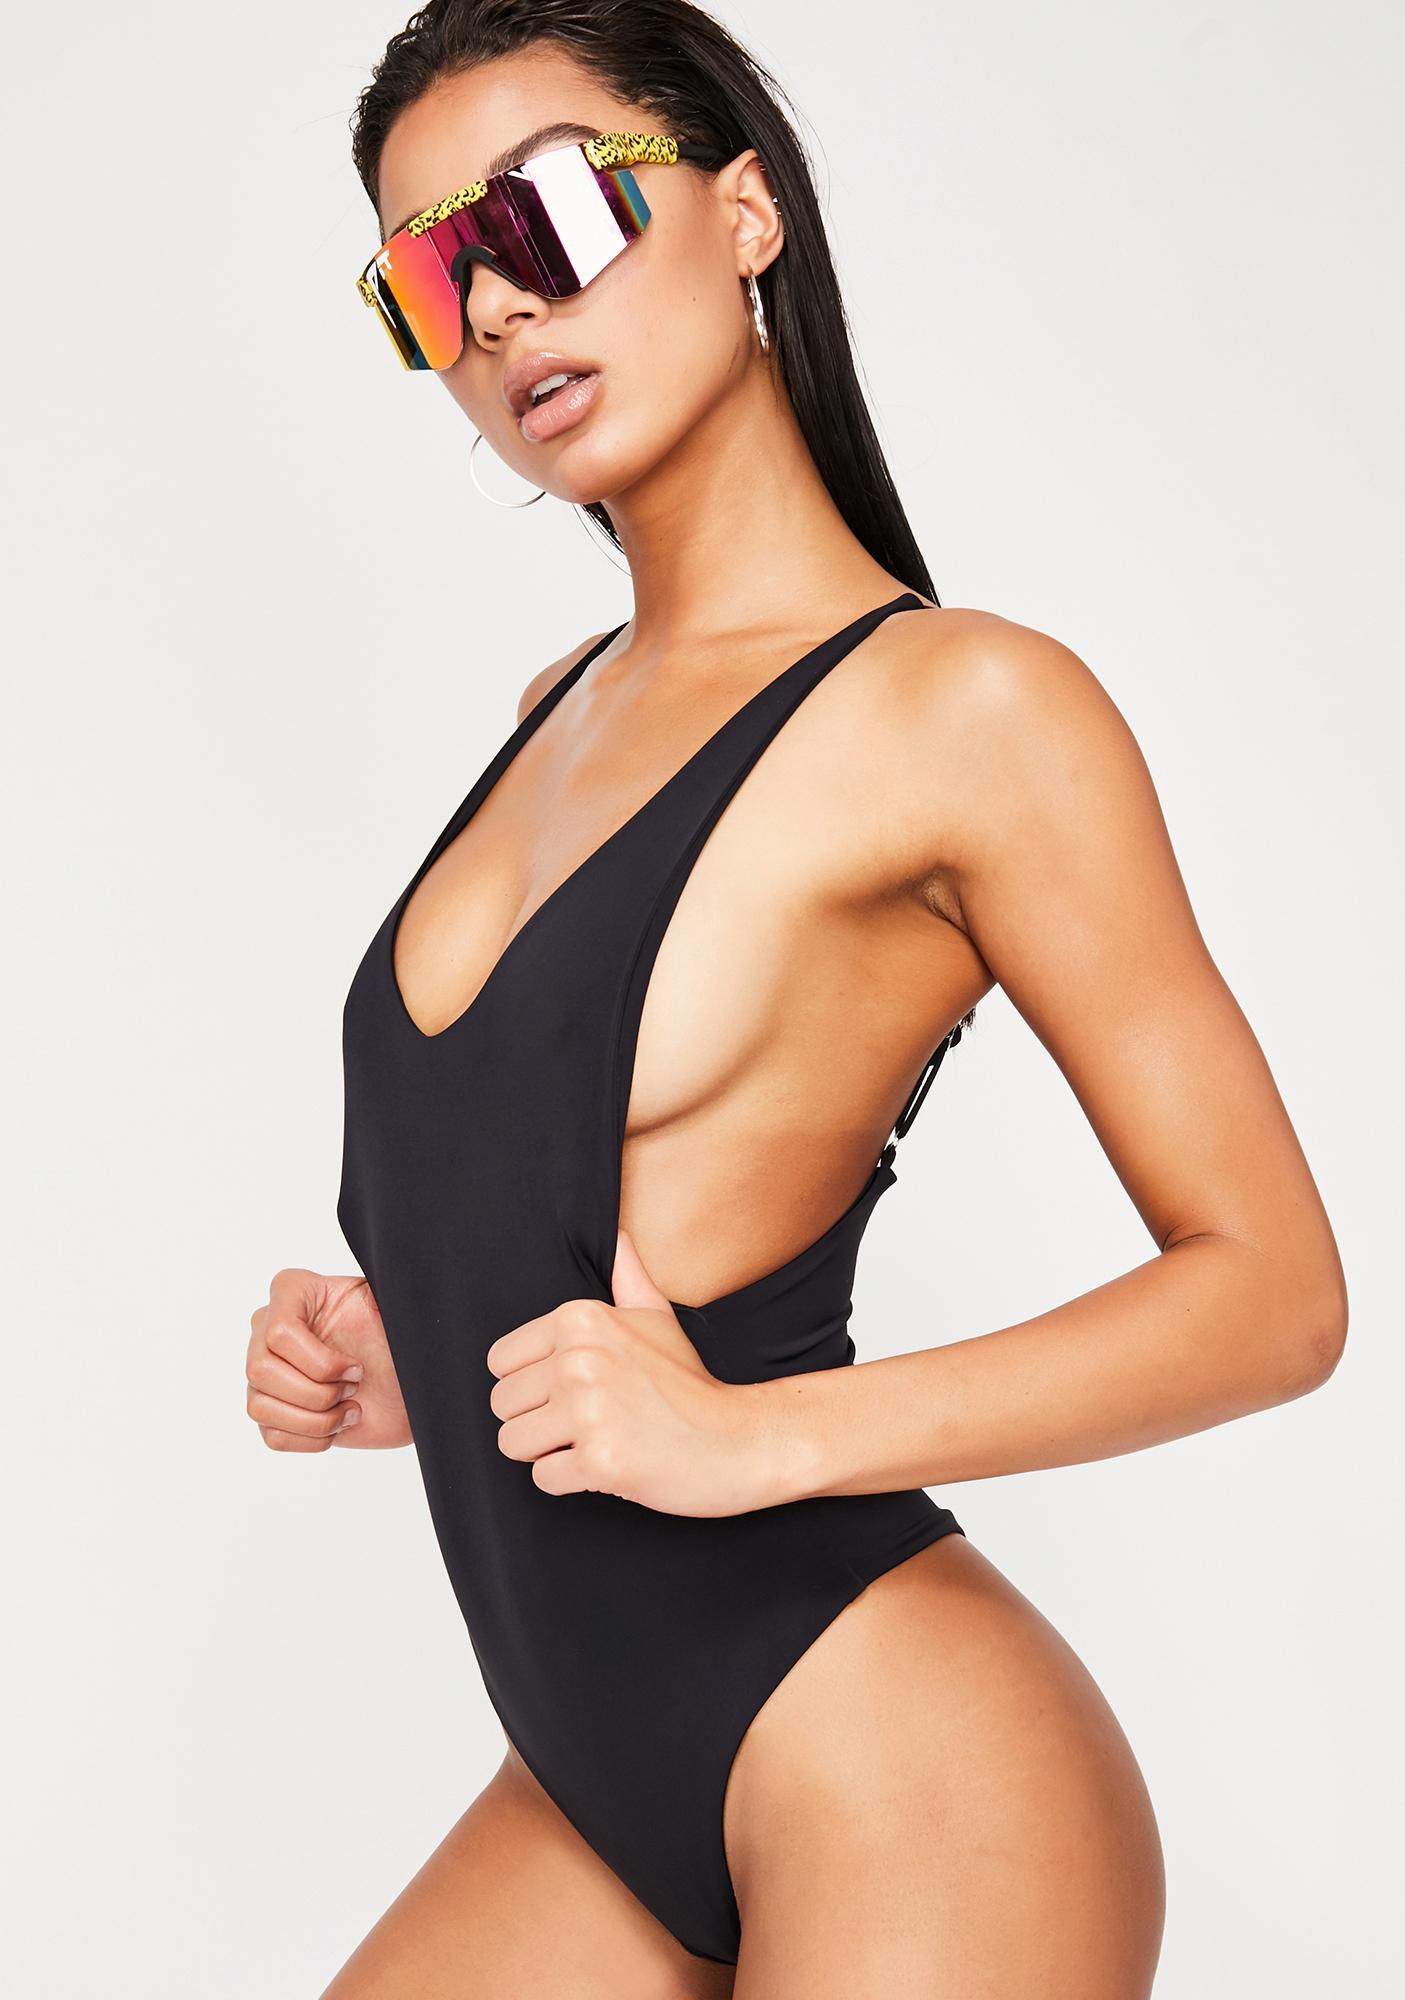 Dippin' Daisy's  Low Back Thong One Piece Bikini